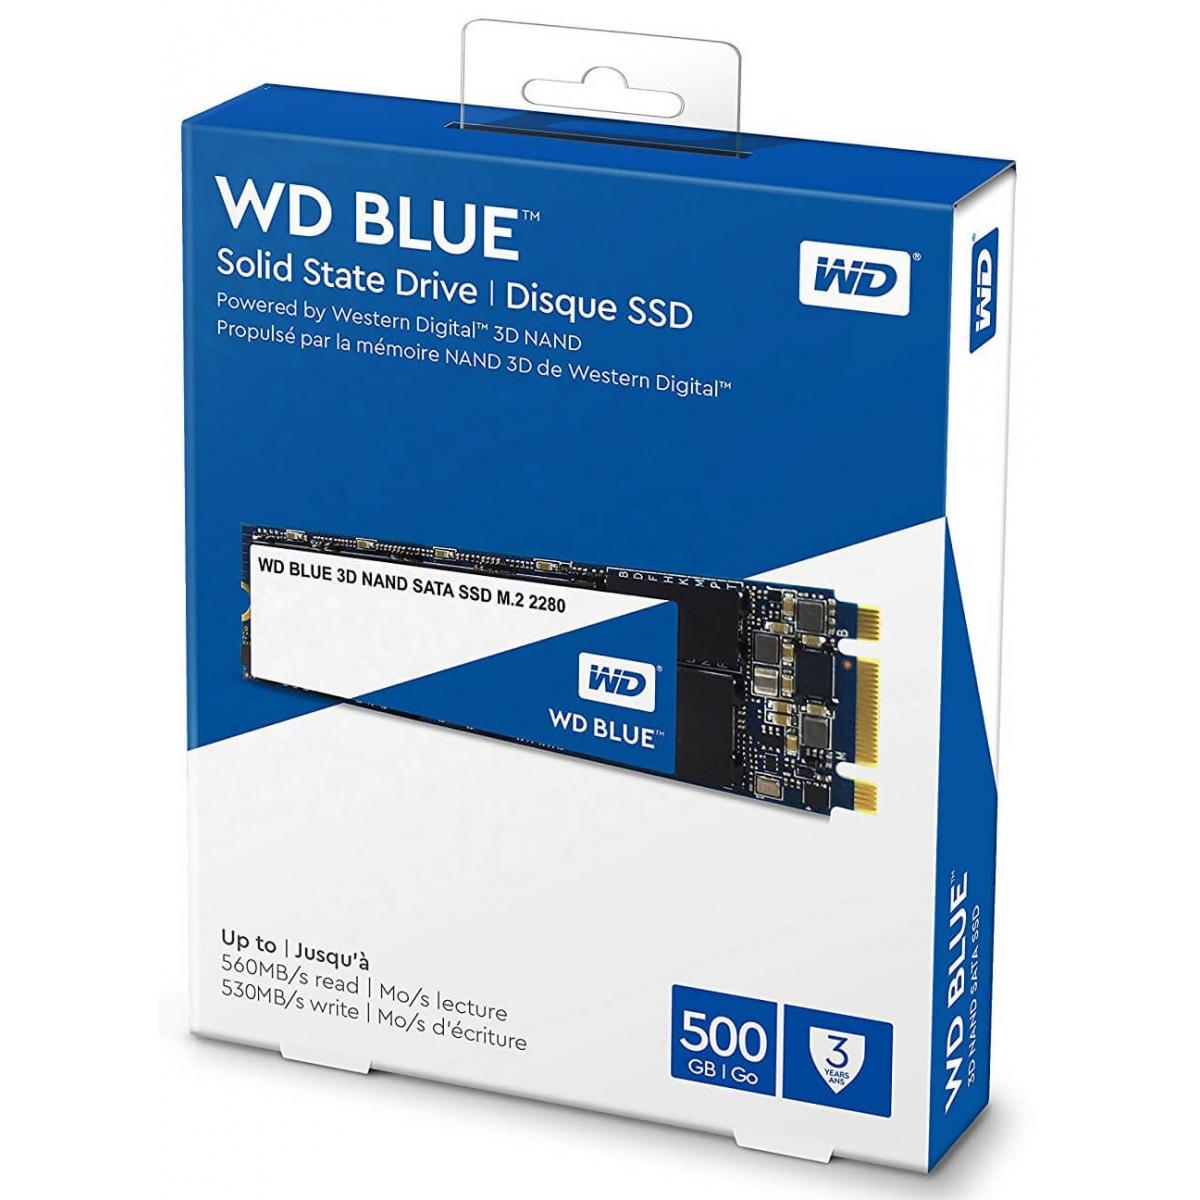 SSD WD Blue, 250GB, M.2 2280, Sata, Leitura: 550MBs e Gravação: 525MBs, WDS250G2B0B